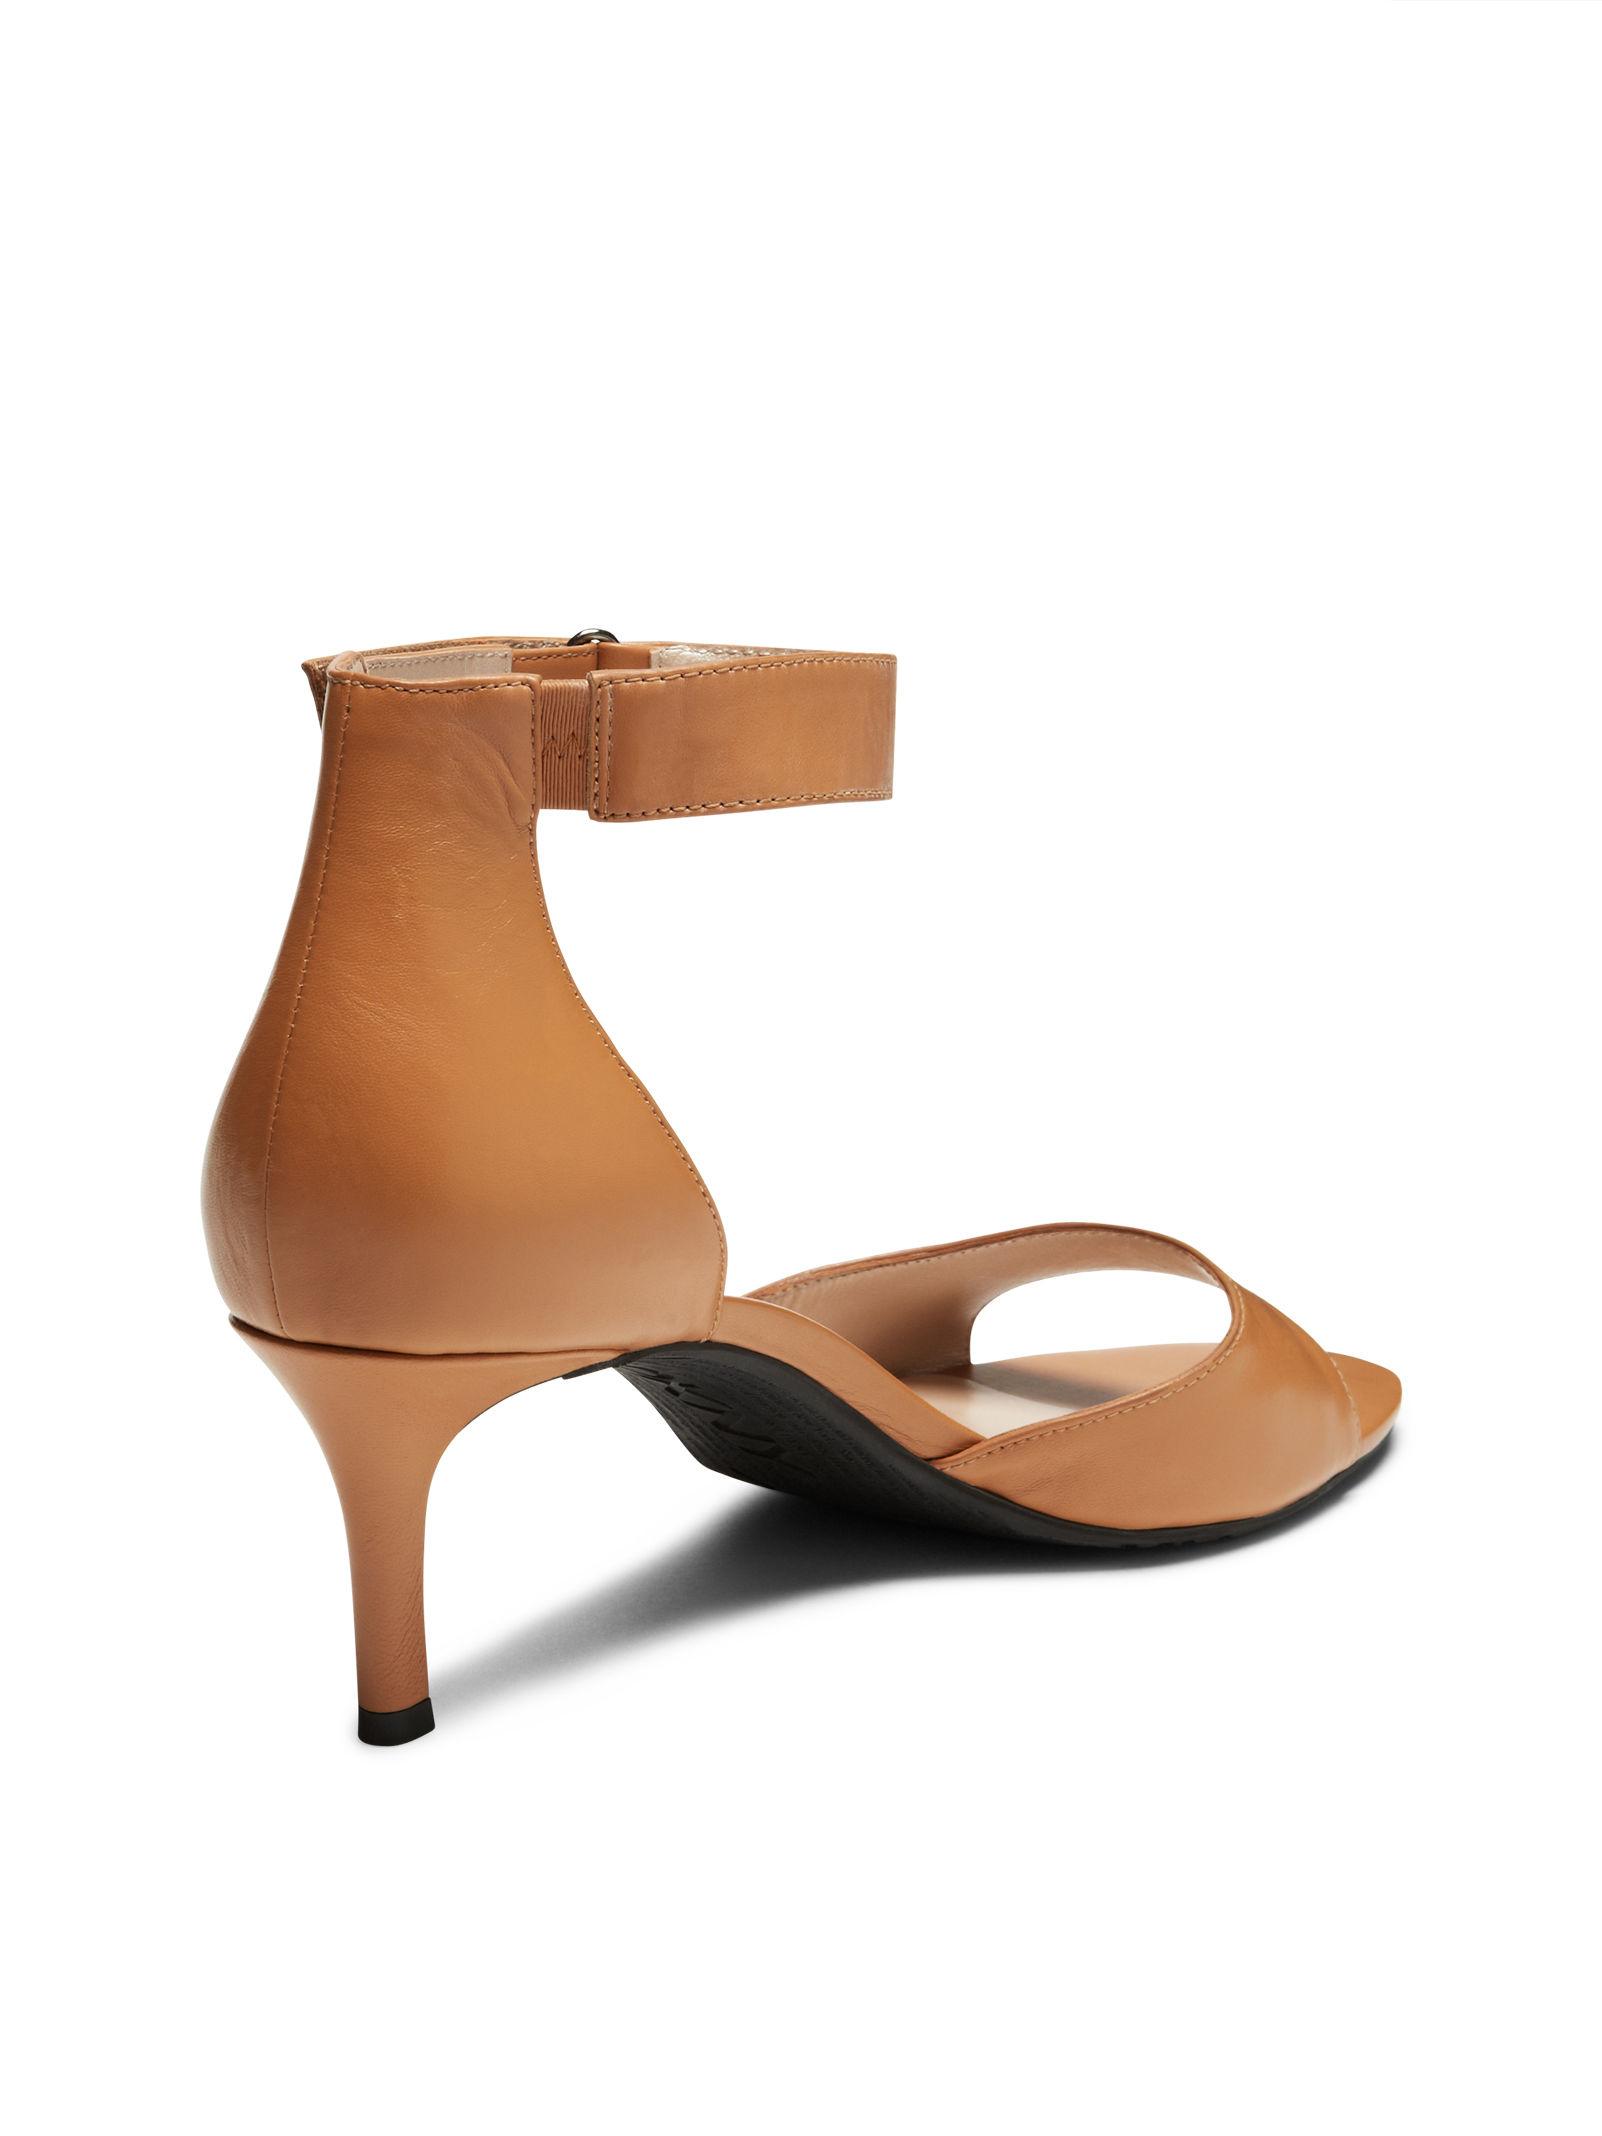 Dkny Gianna Kitten Heel Sandal in Brown | Lyst